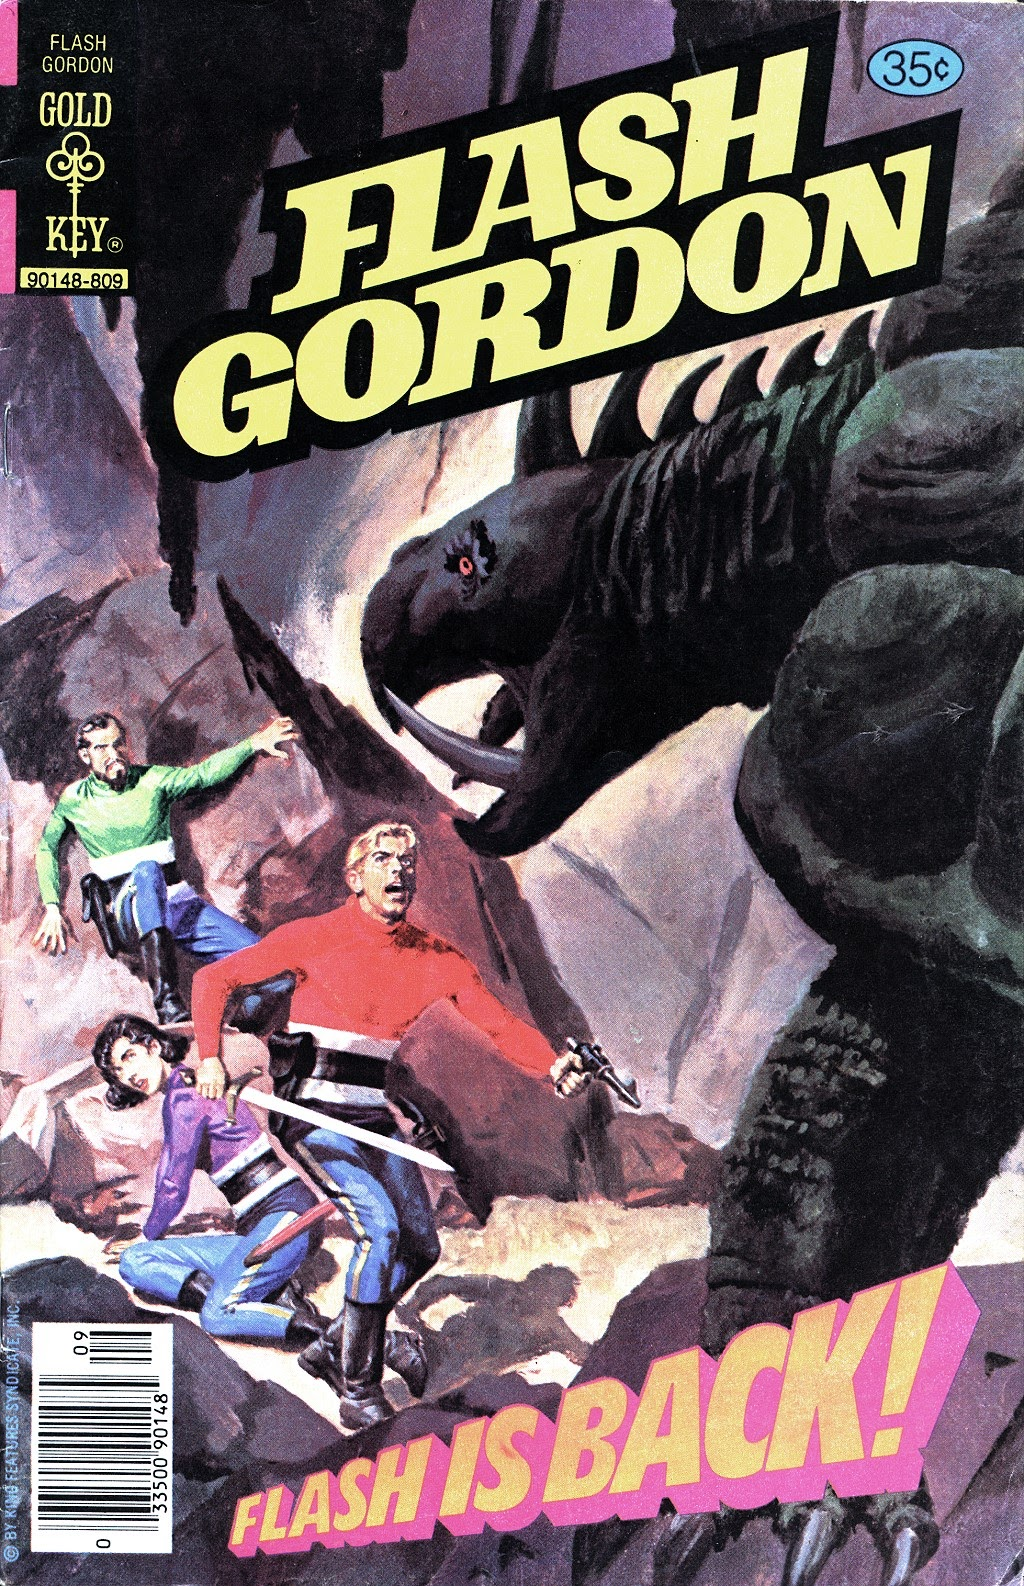 Flash Gordon (1978) 19 Page 1